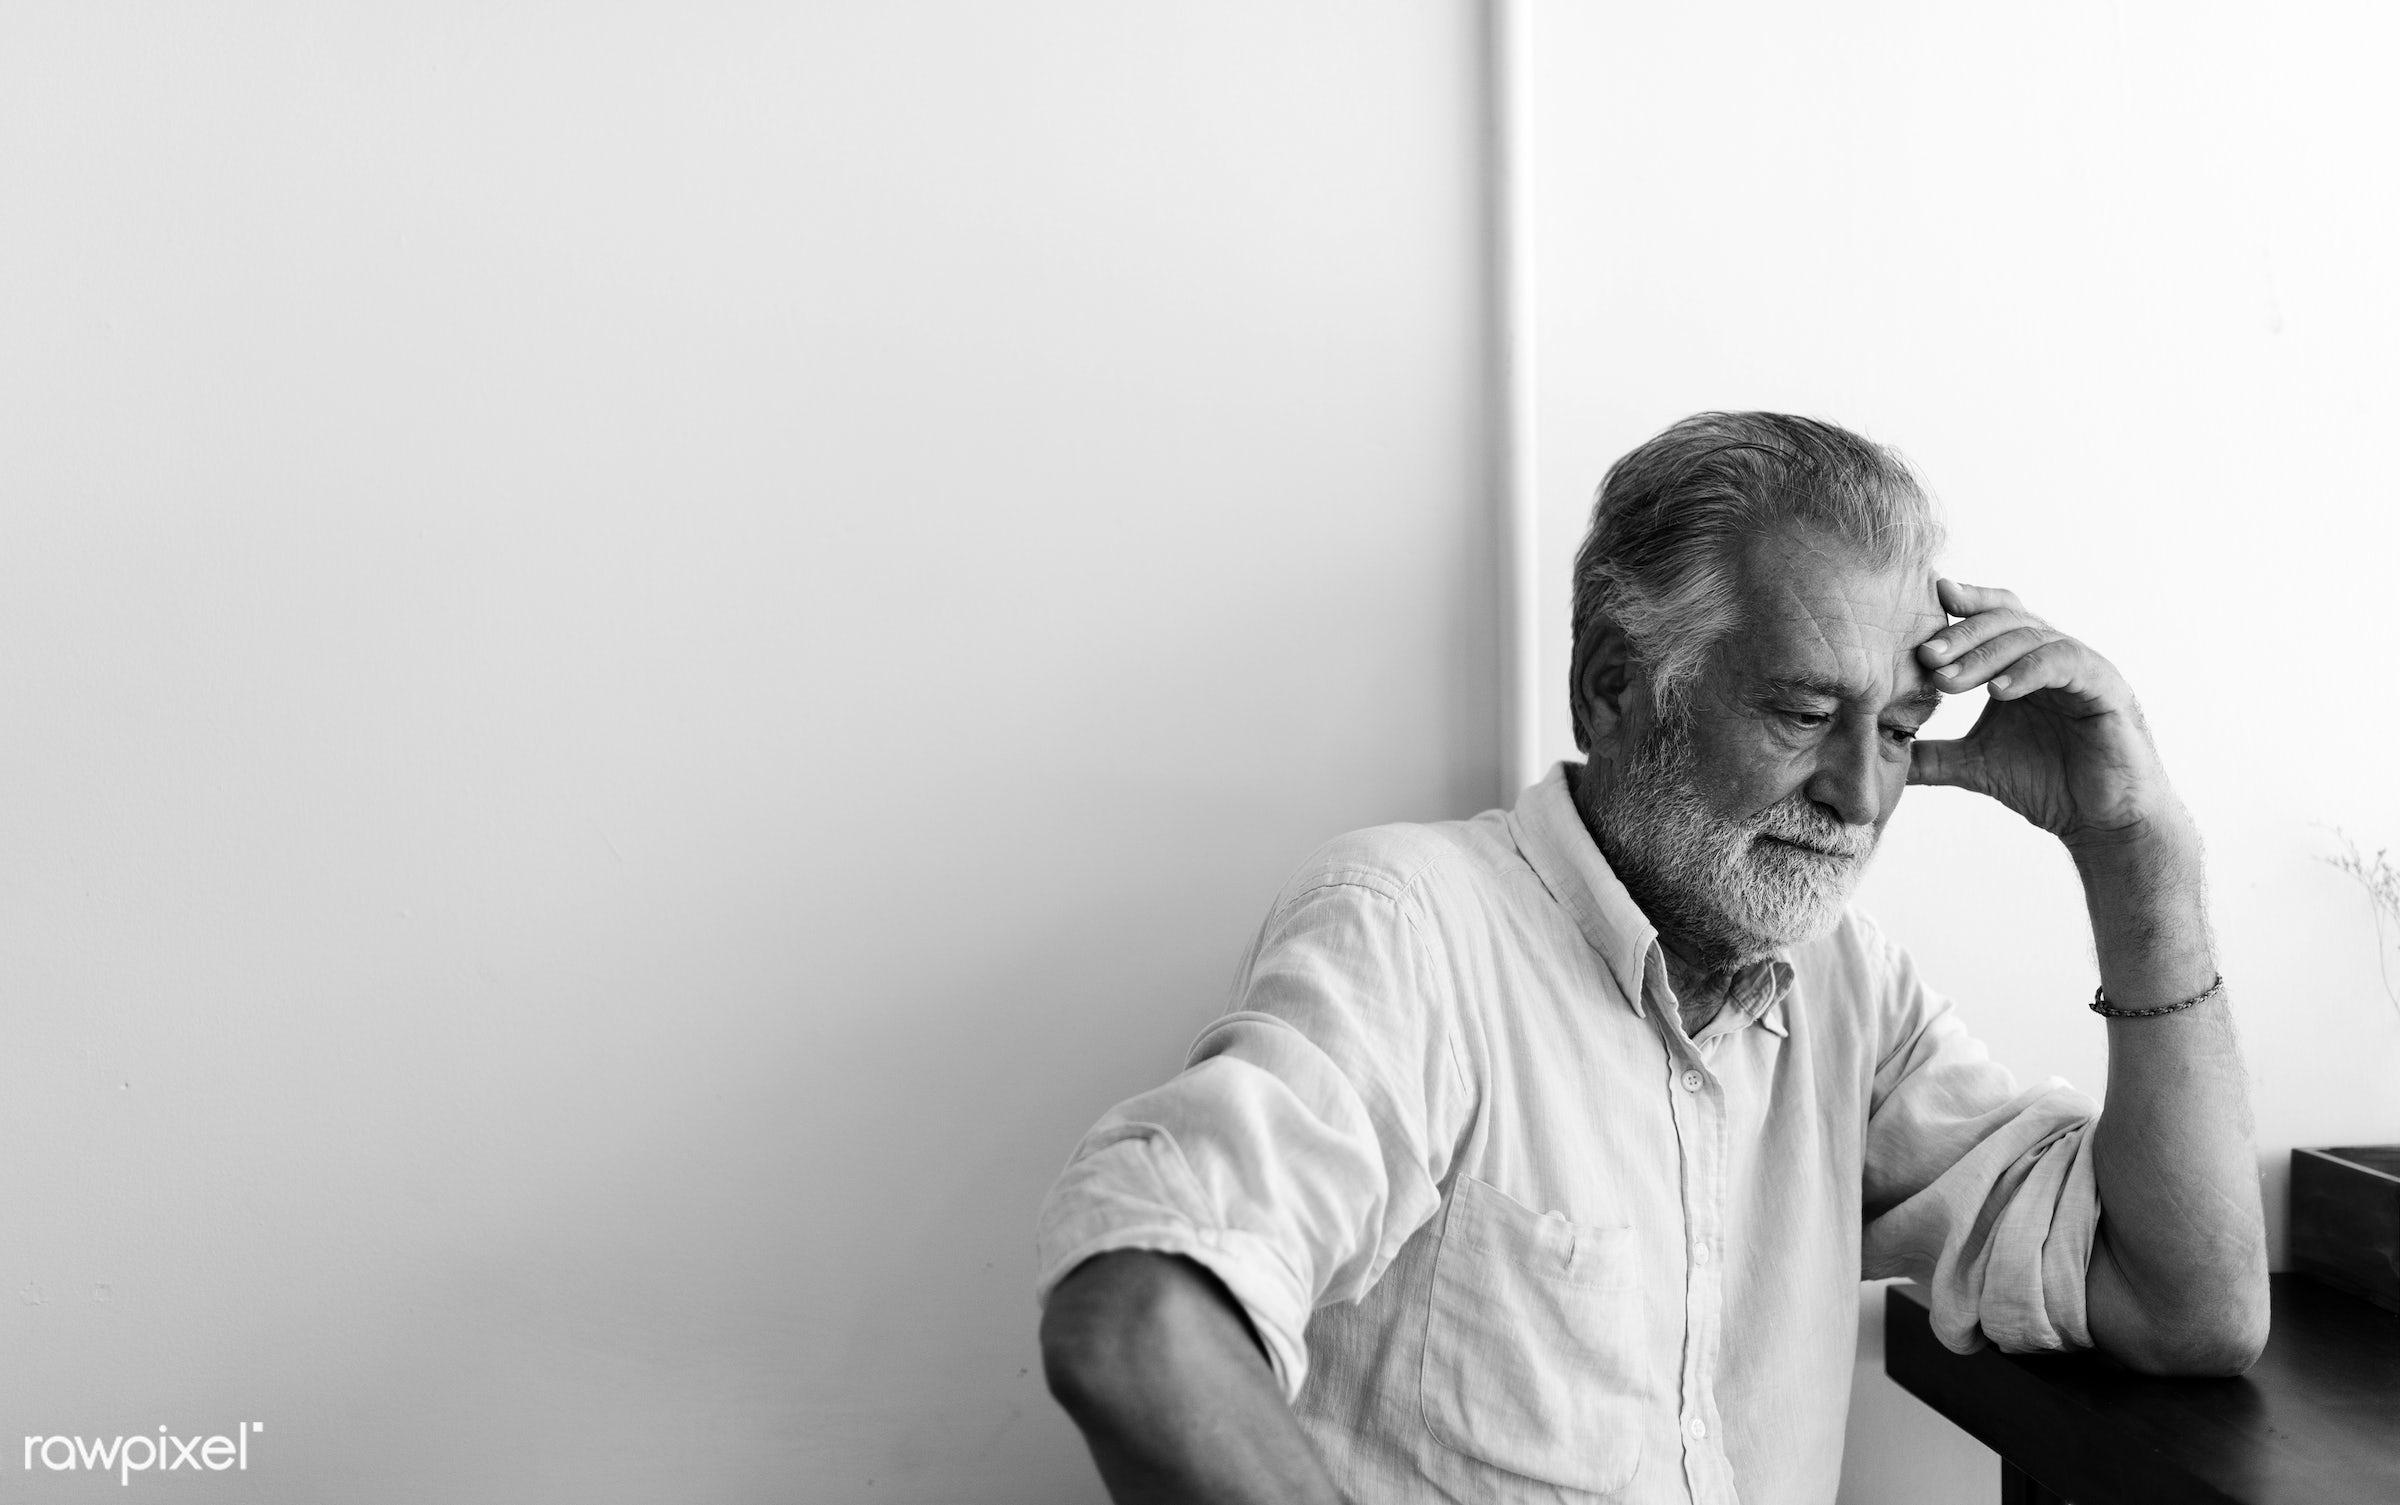 Elderly man is sitting thoughtfully - alone, beard, black and white, caucasian, depressed, elderly, emotion, expression,...